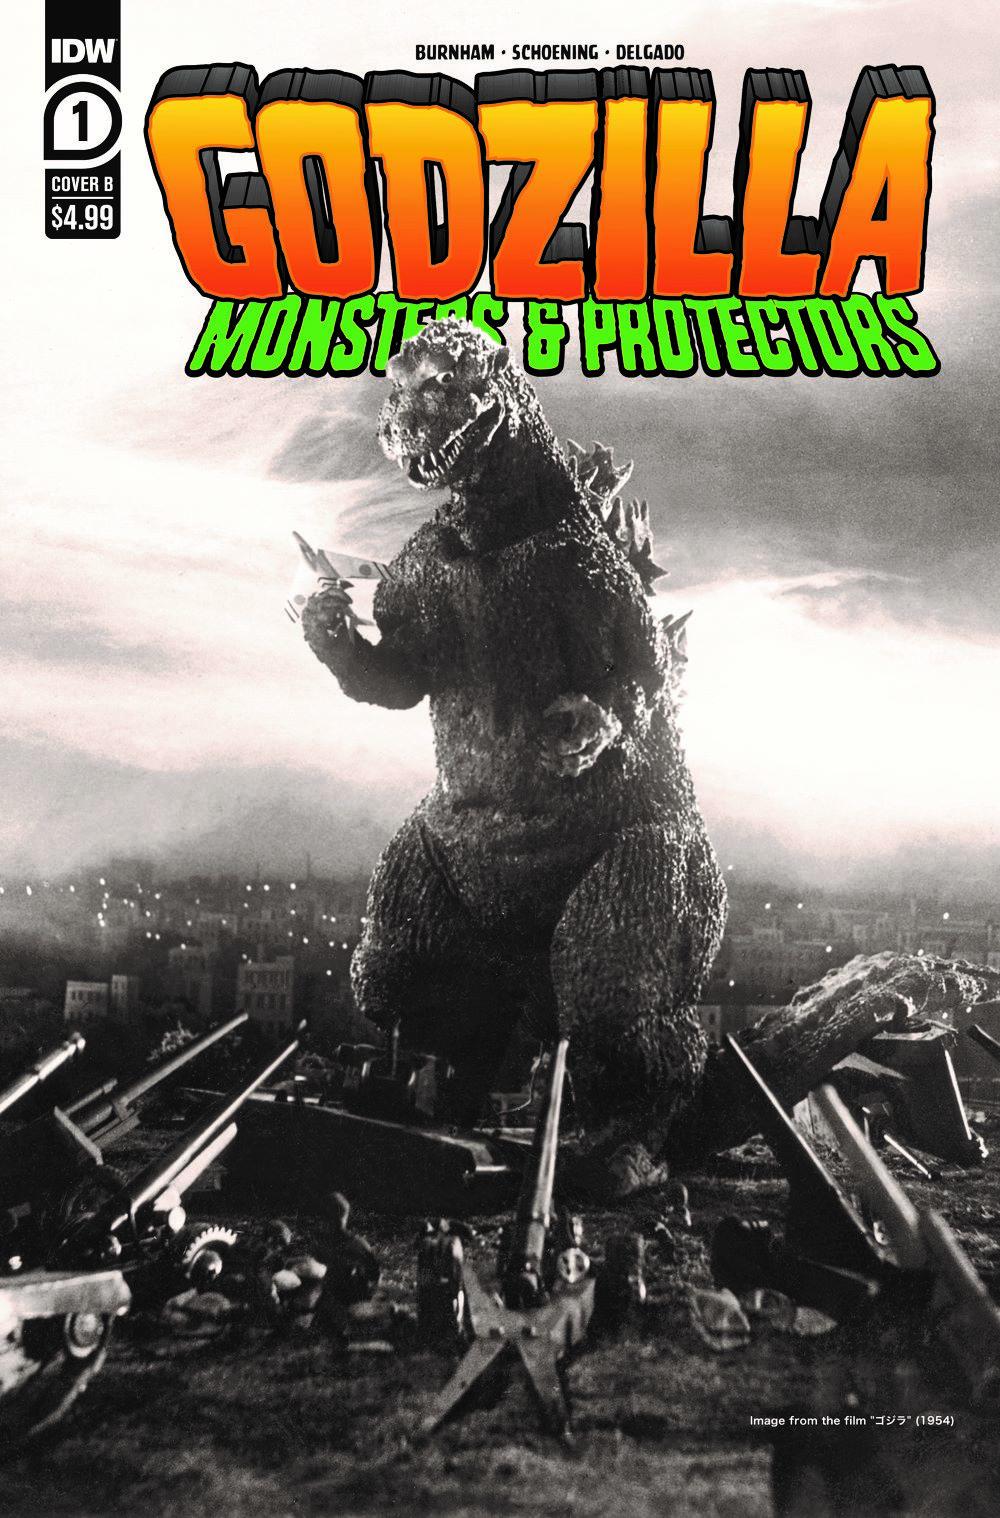 Godzilla_MP01-coverB ComicList Previews: GODZILLA MONSTERS AND PROTECTORS #1 (OF 5)